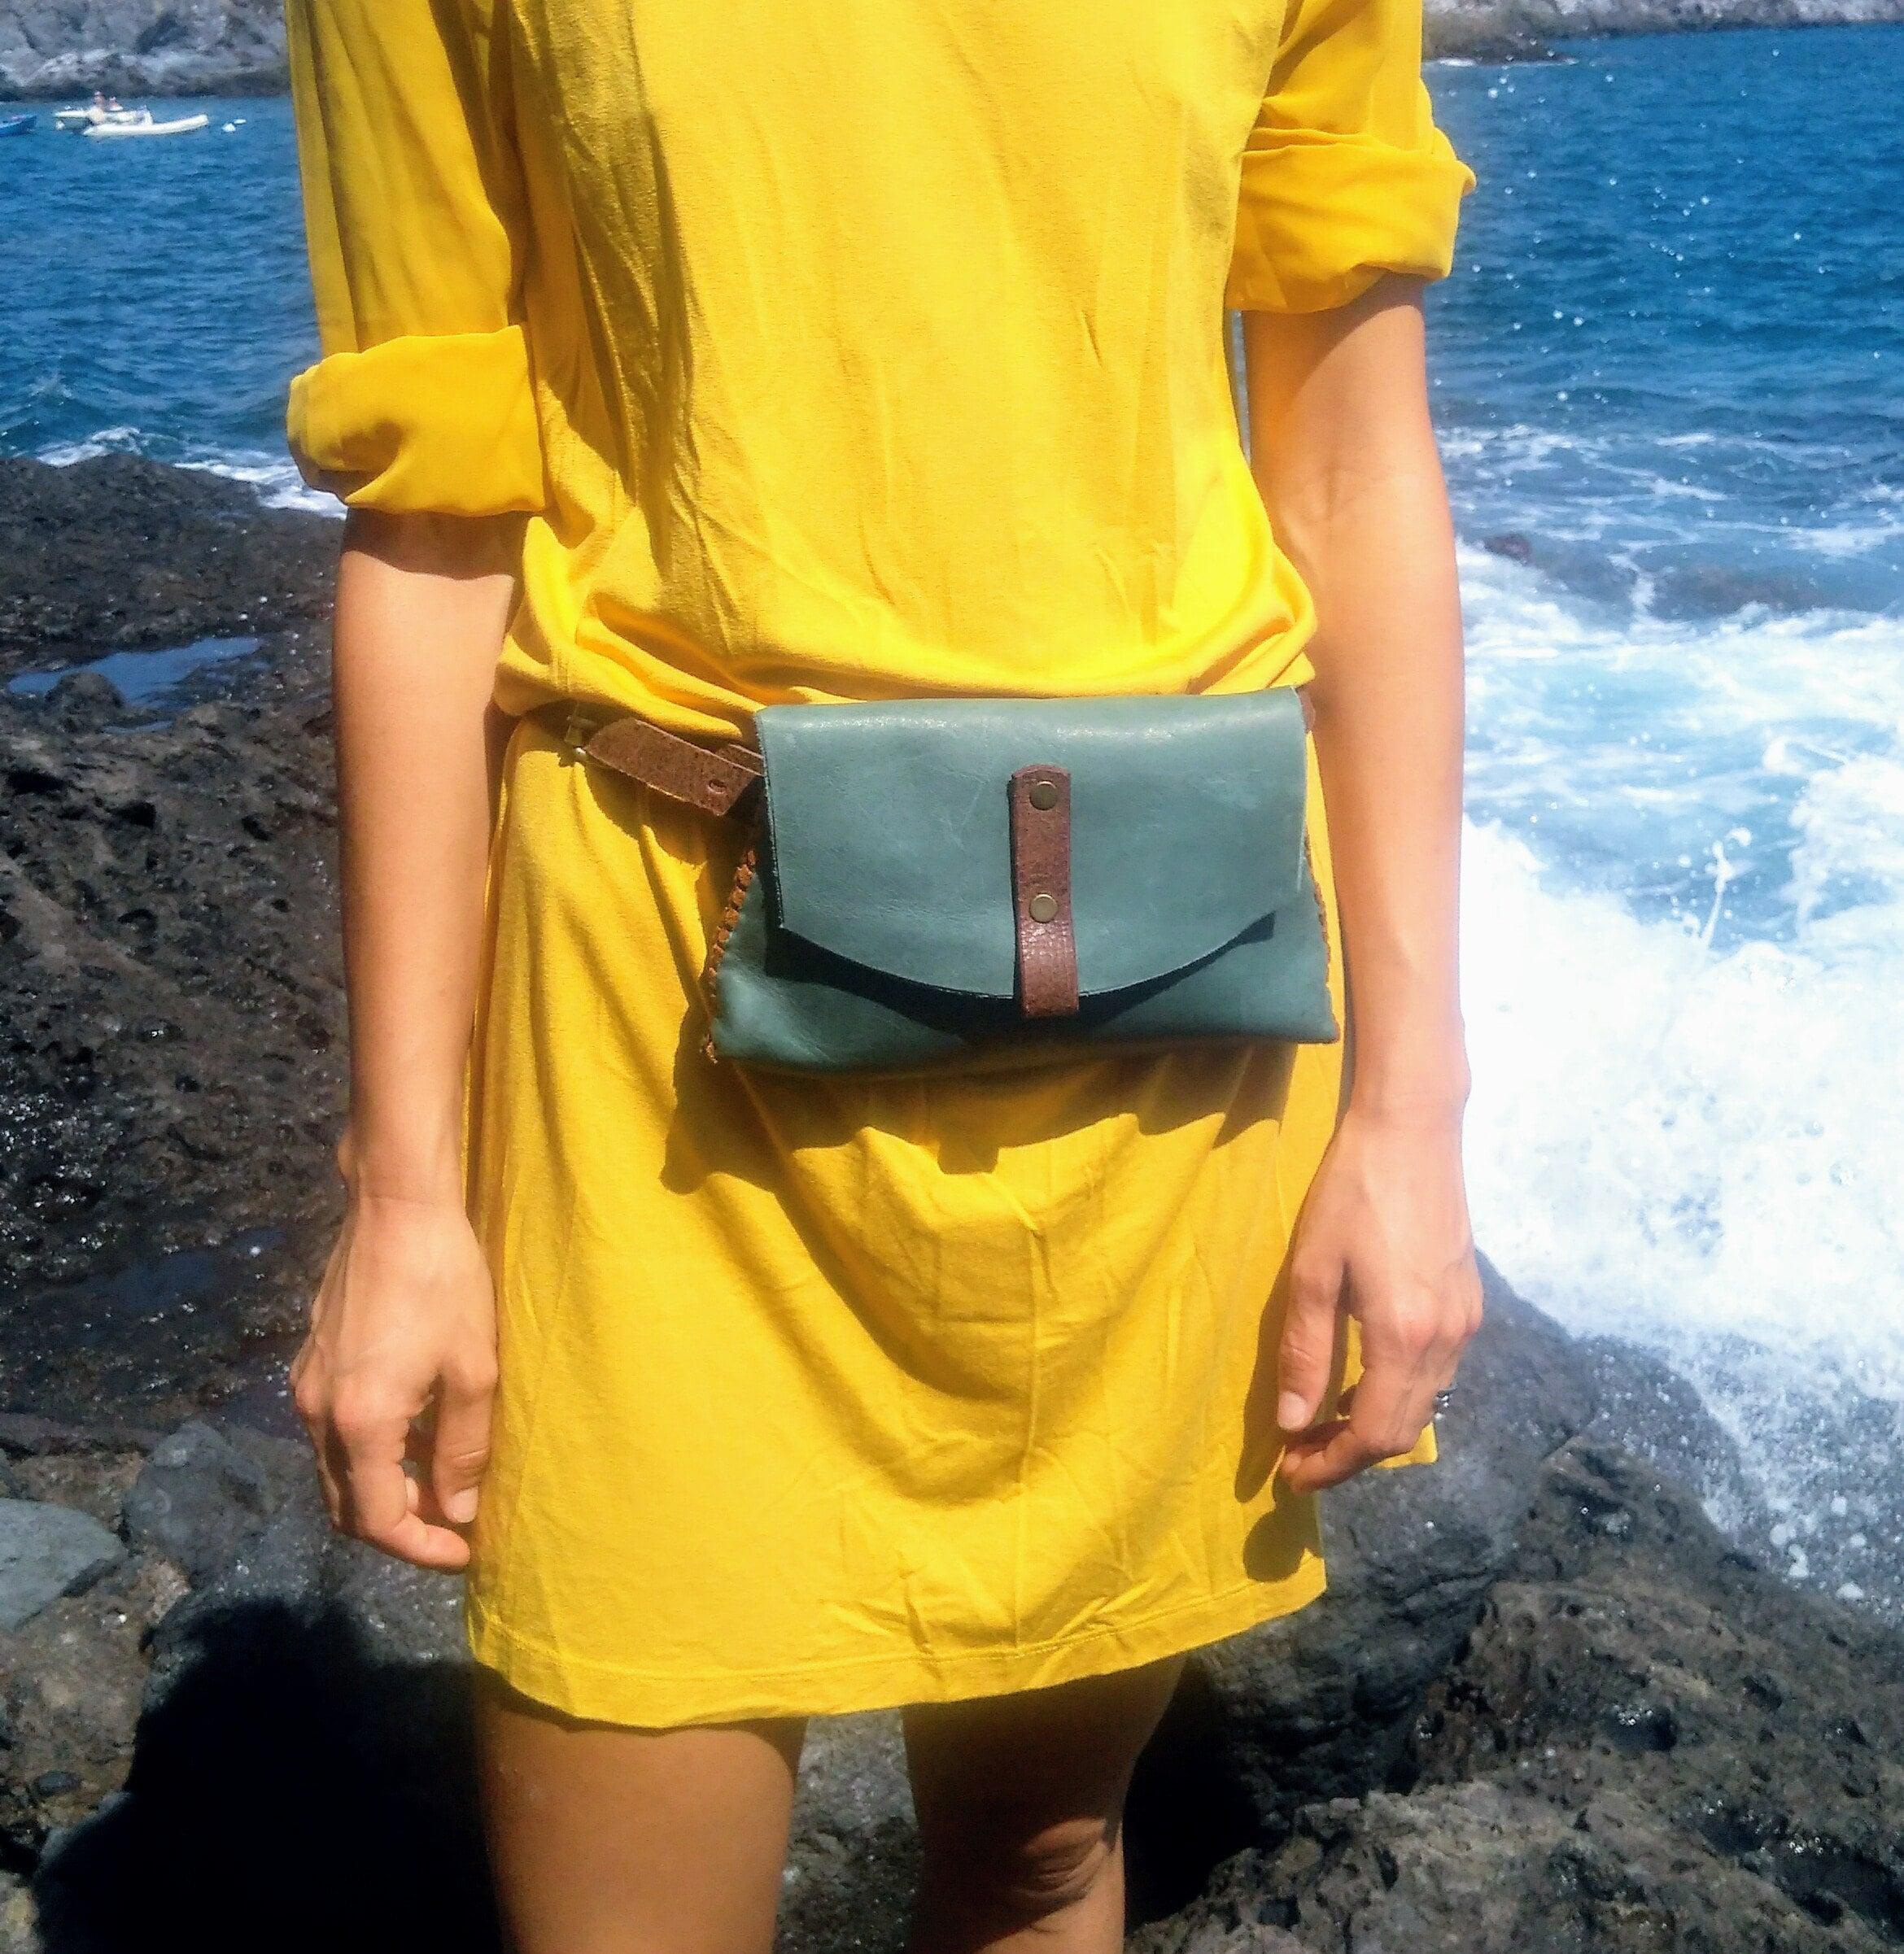 Belt Bag*Fanny Pack*Waist Bag*Women Leather Waistbag* Fanny Bag*Travel Bag*Small Bag*Women Bag*Leather Bag*Fashion Bag*Handmade Belt Bag